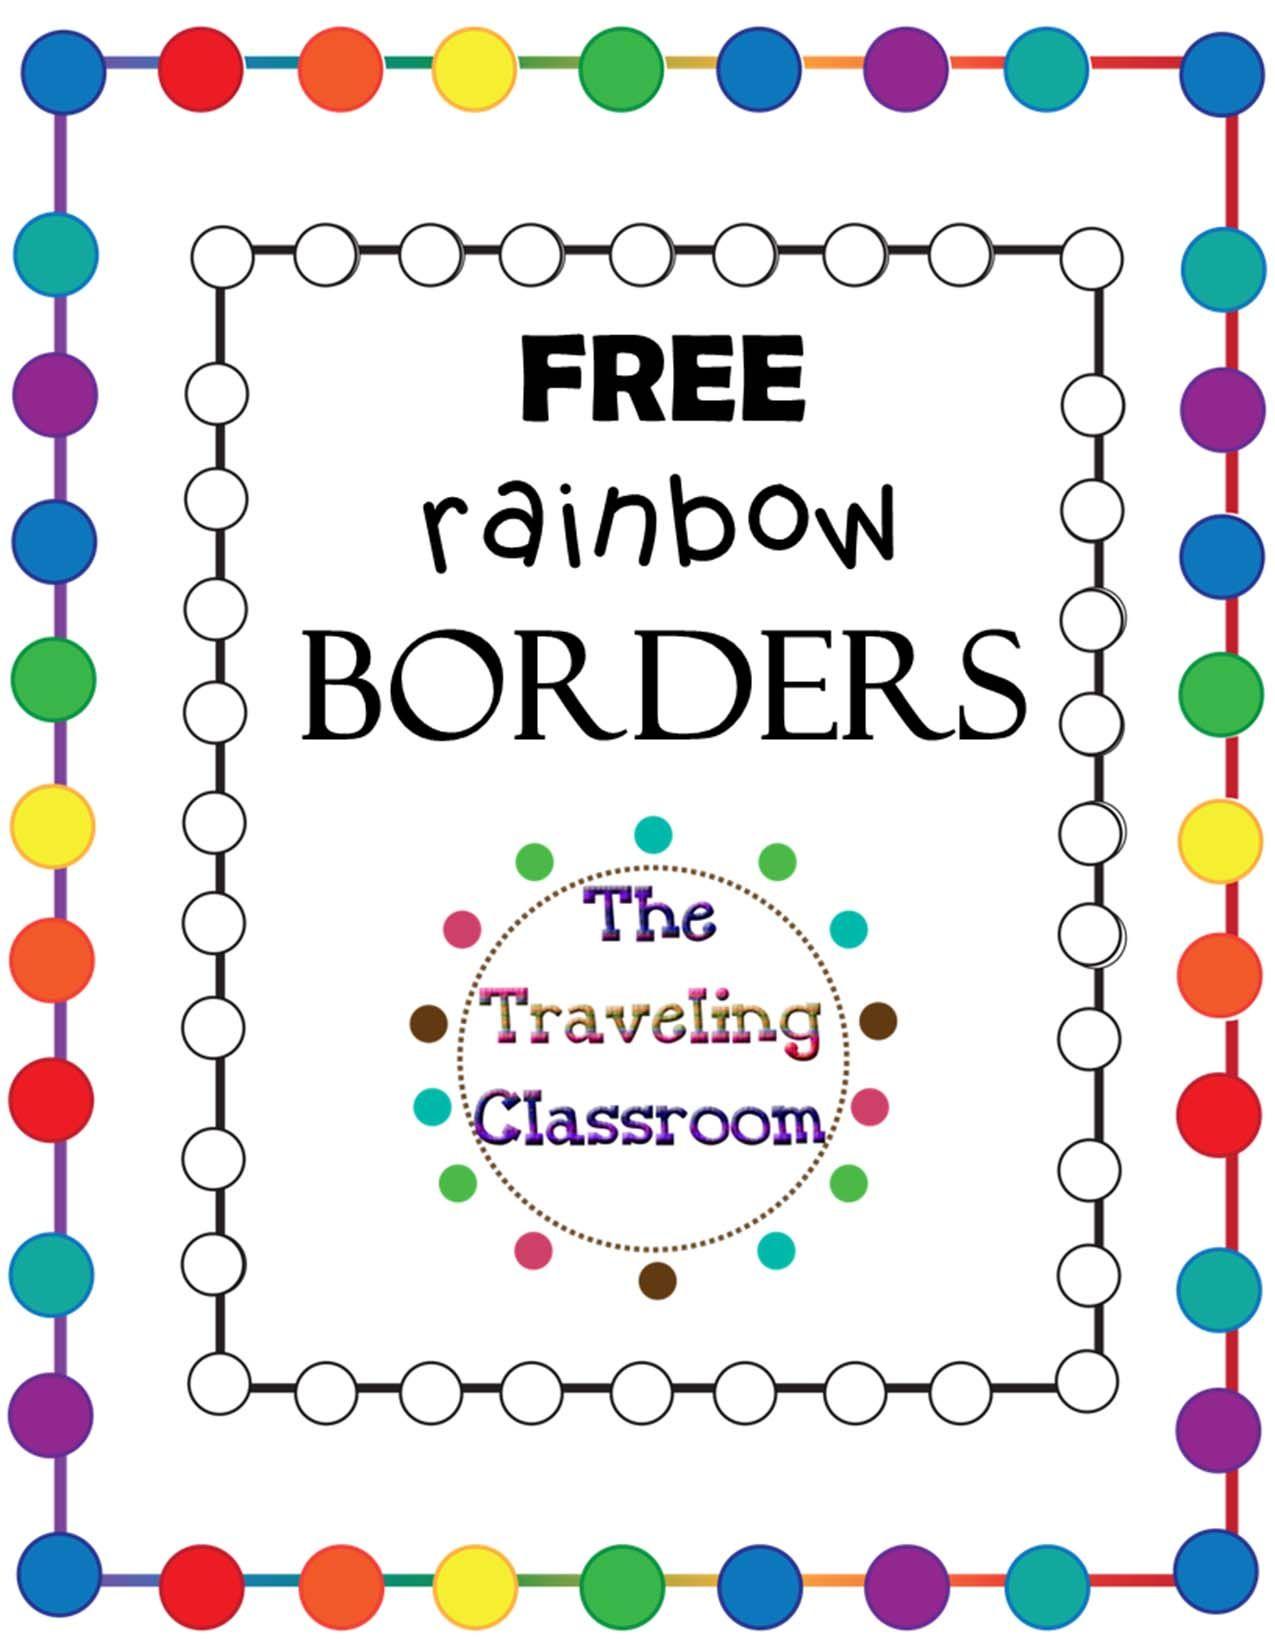 FREE Rainbow Borders.